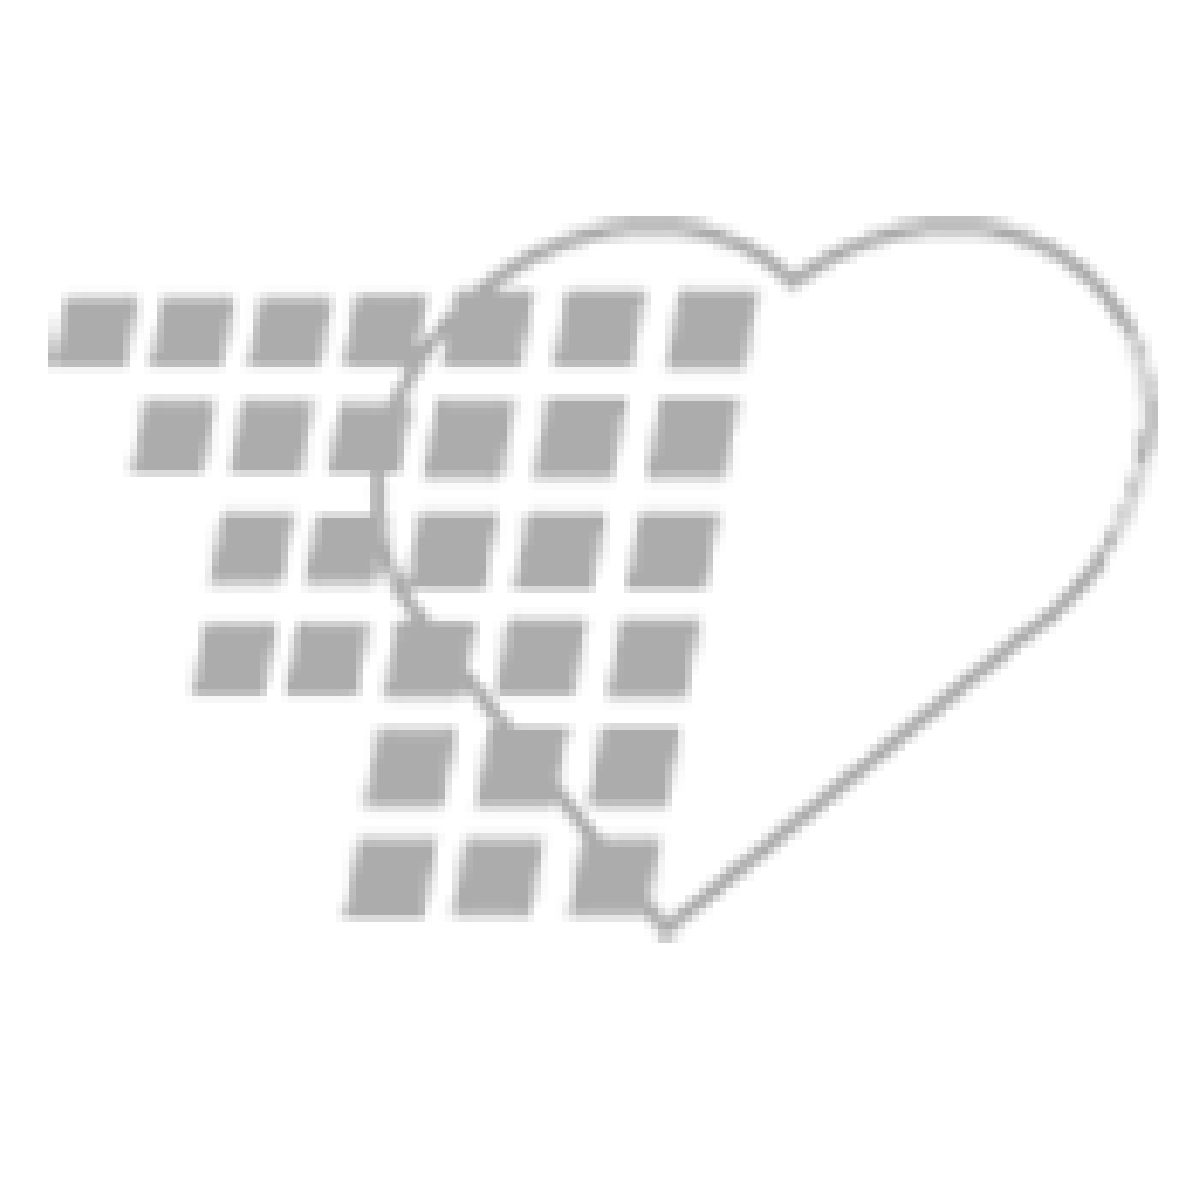 04-25-3130 SimCabRx™ Pharmacy Standard 20 bins with printer